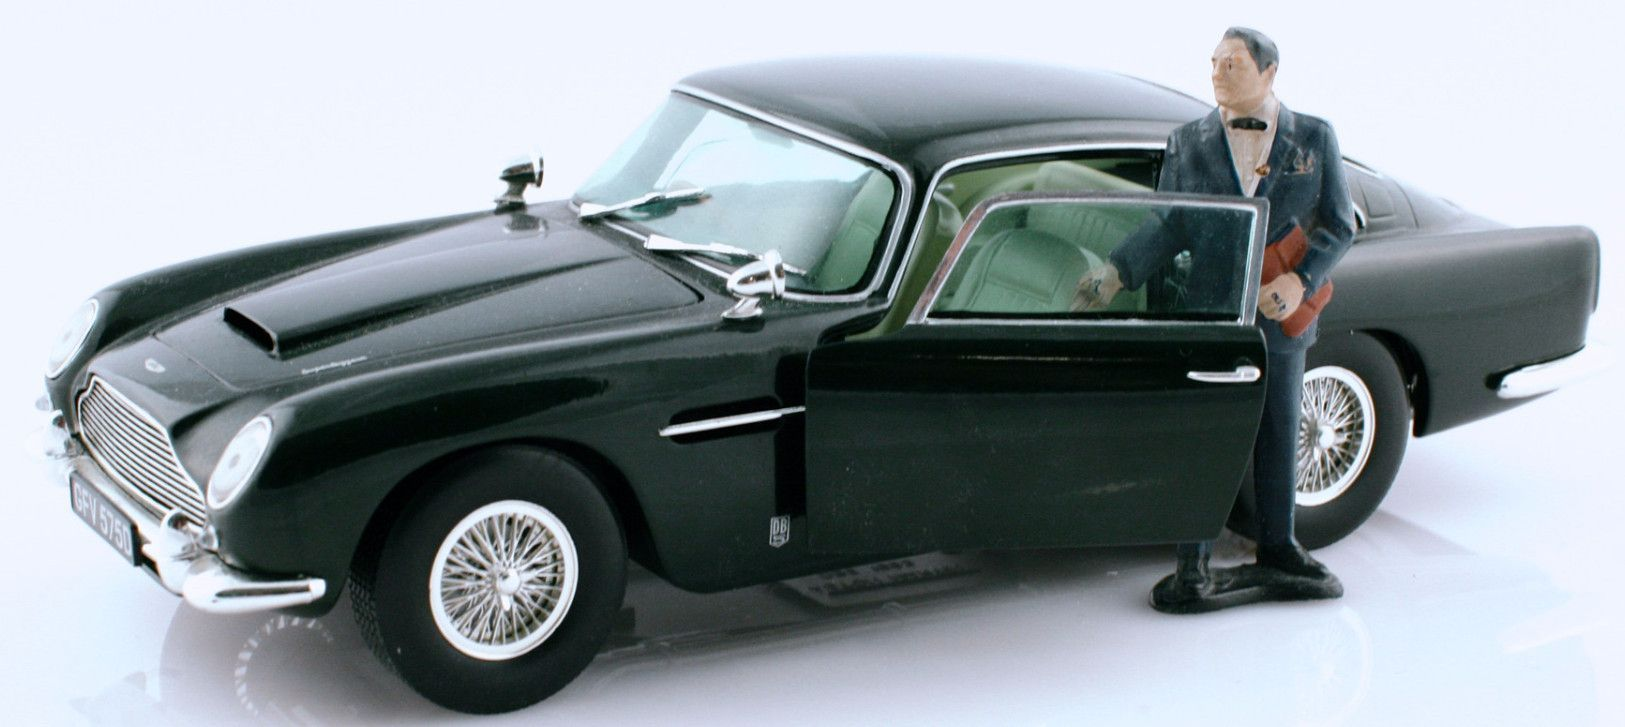 aston martin db5 in british racing green colour! scale model w/ jb